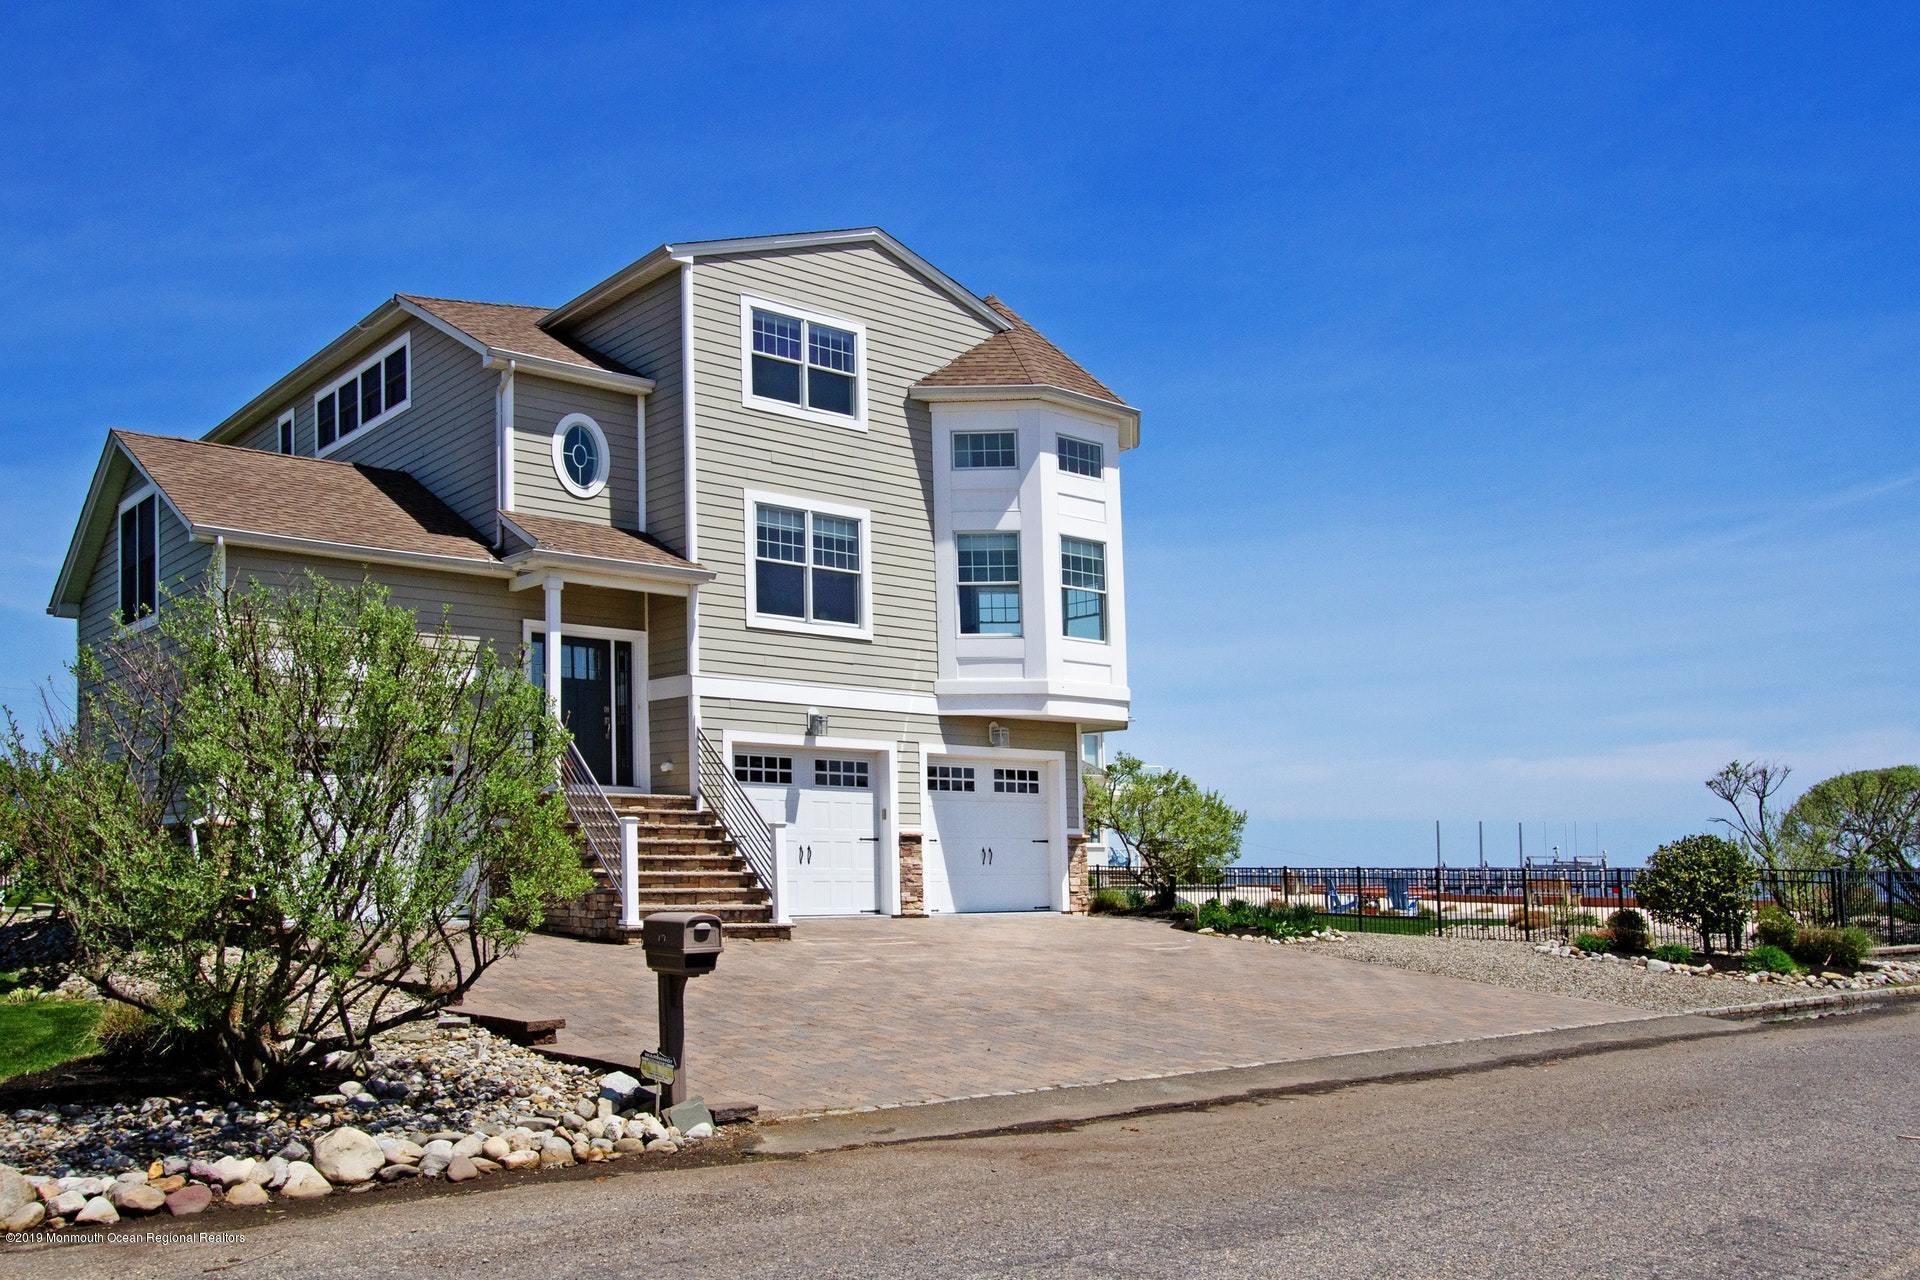 Waretown NJ Real Estate : Search Waretown Homes for Sale, Ocean County